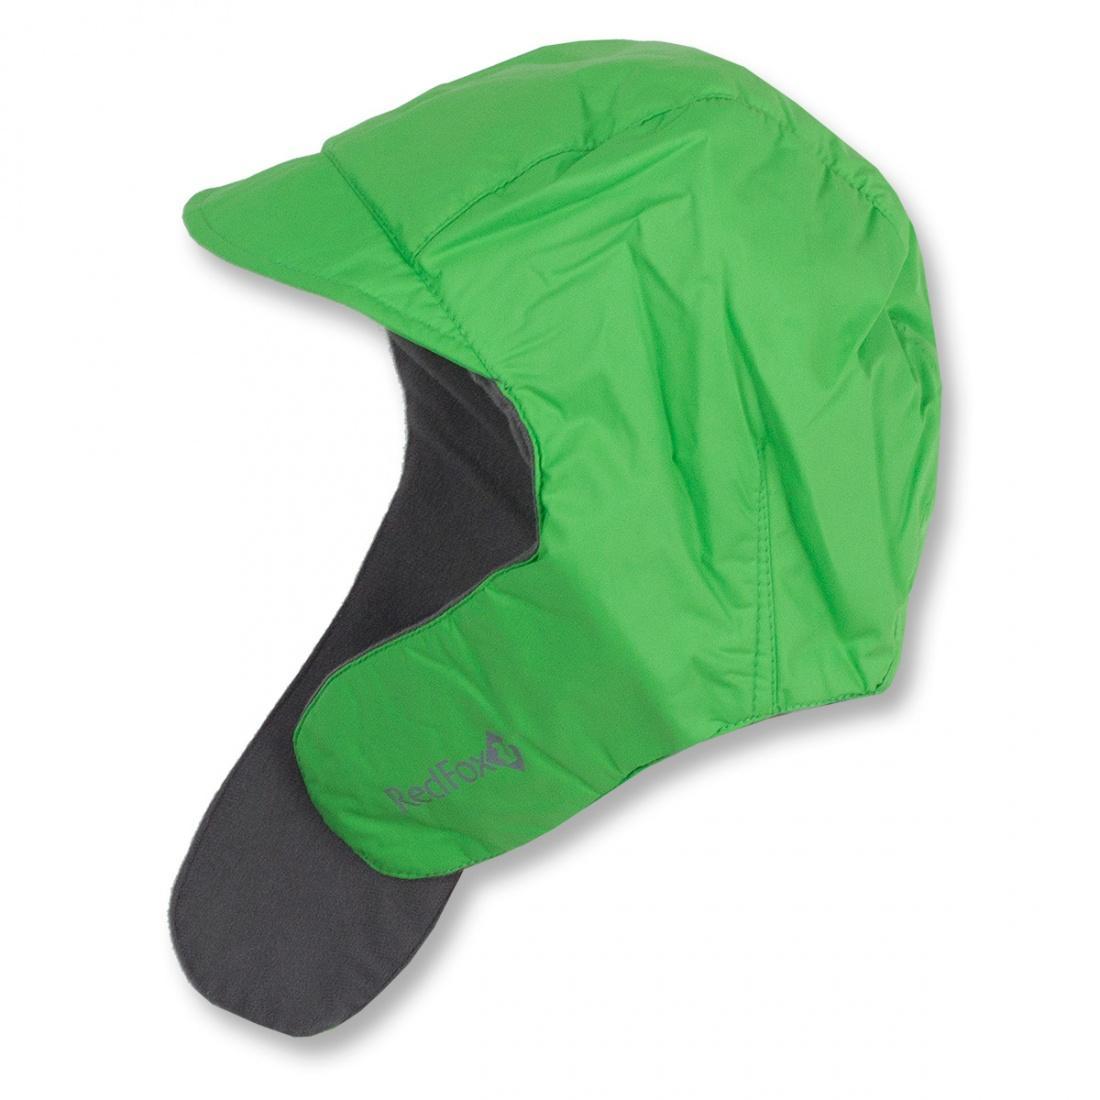 Шапка детска PilotУшанки<br><br> Удобна стильна шапочка дл детей от года. <br><br> <br><br><br><br> Материал – Dry Factor 1000.<br><br> <br><br><br> Утеплитель – Omniterm Classic.<br><br> <br><br><br> Облегащий крой.<br><br> <br><br>...<br><br>Цвет: Салатовый<br>Размер: L